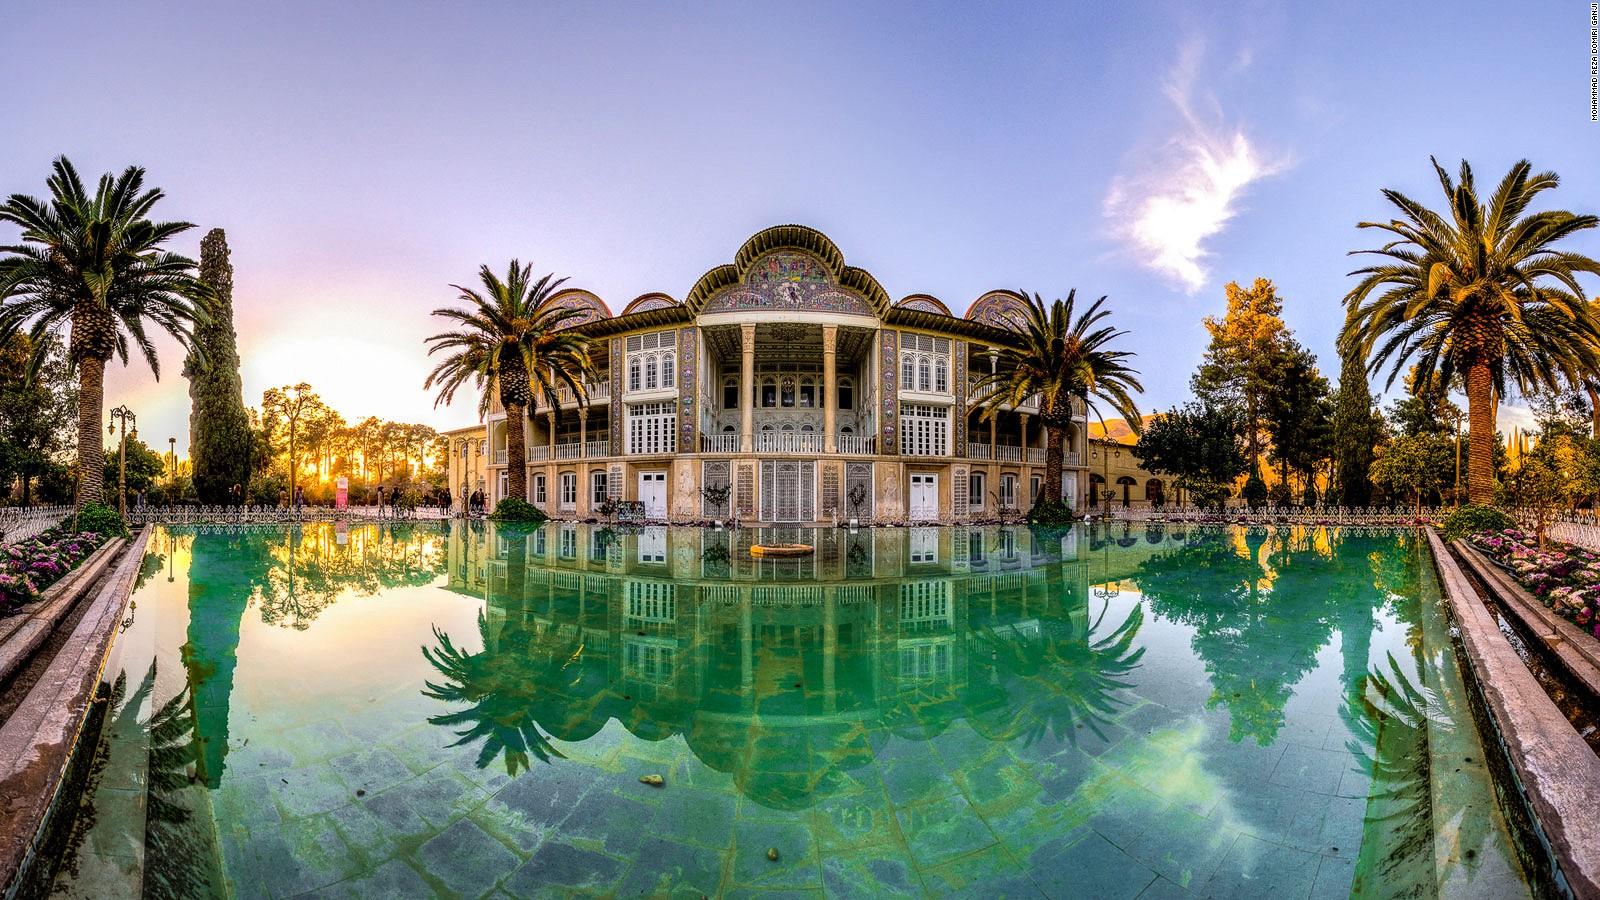 160210133440-eram-garden--shiraz-7-full-169.jpg